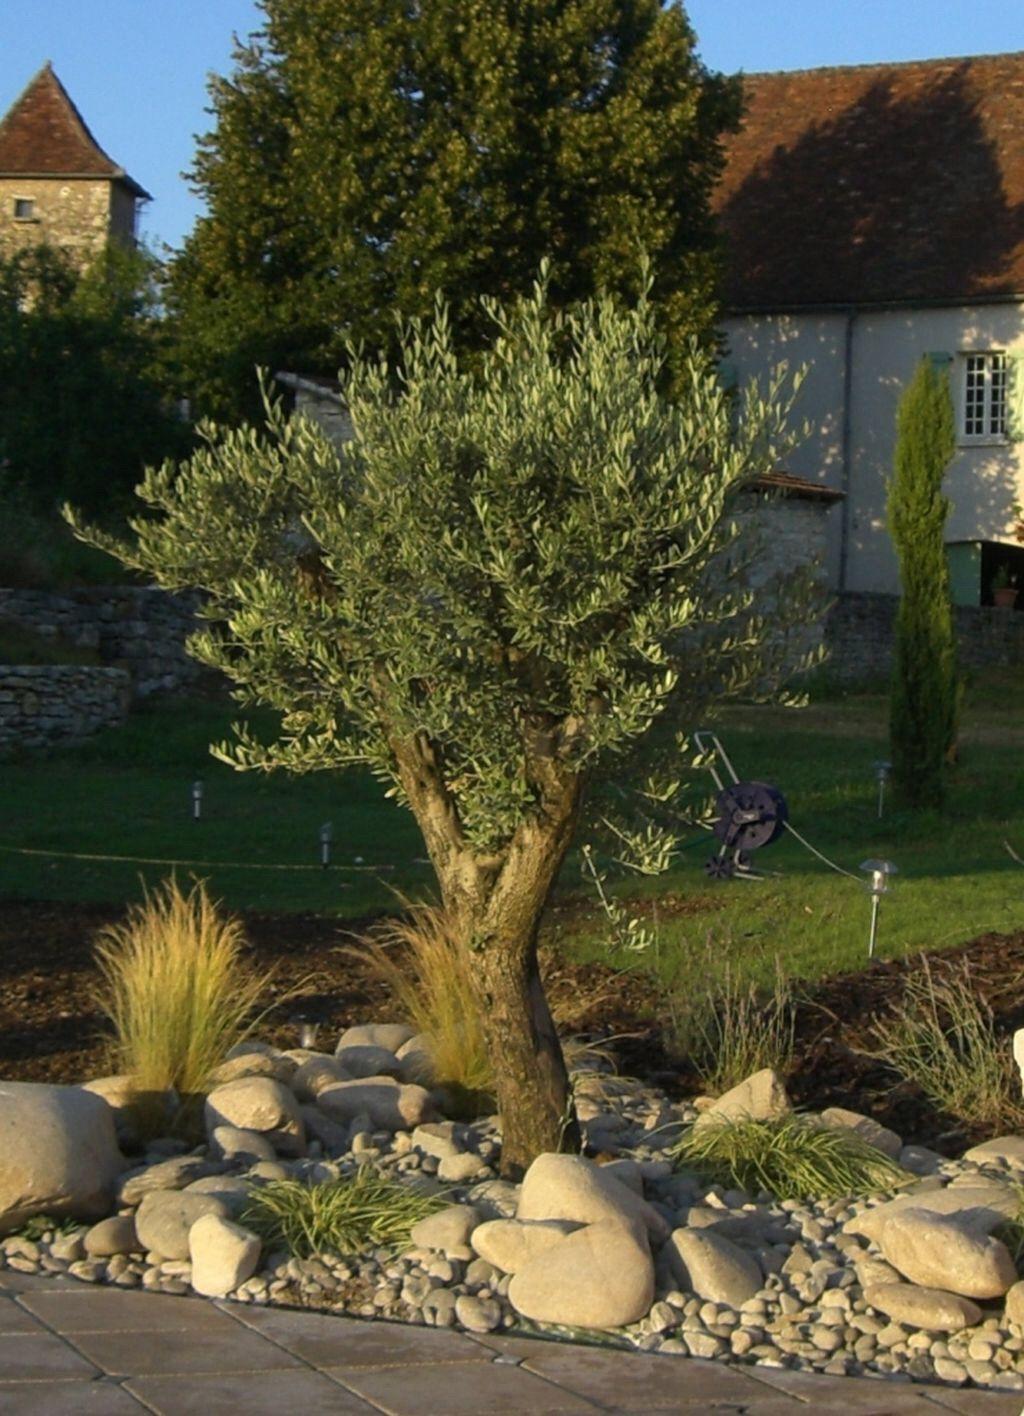 Rocaille Mediterraneenne | Outdoor | Amenagement Jardin ... encequiconcerne Amenagement Petit Jardin Mediterraneen